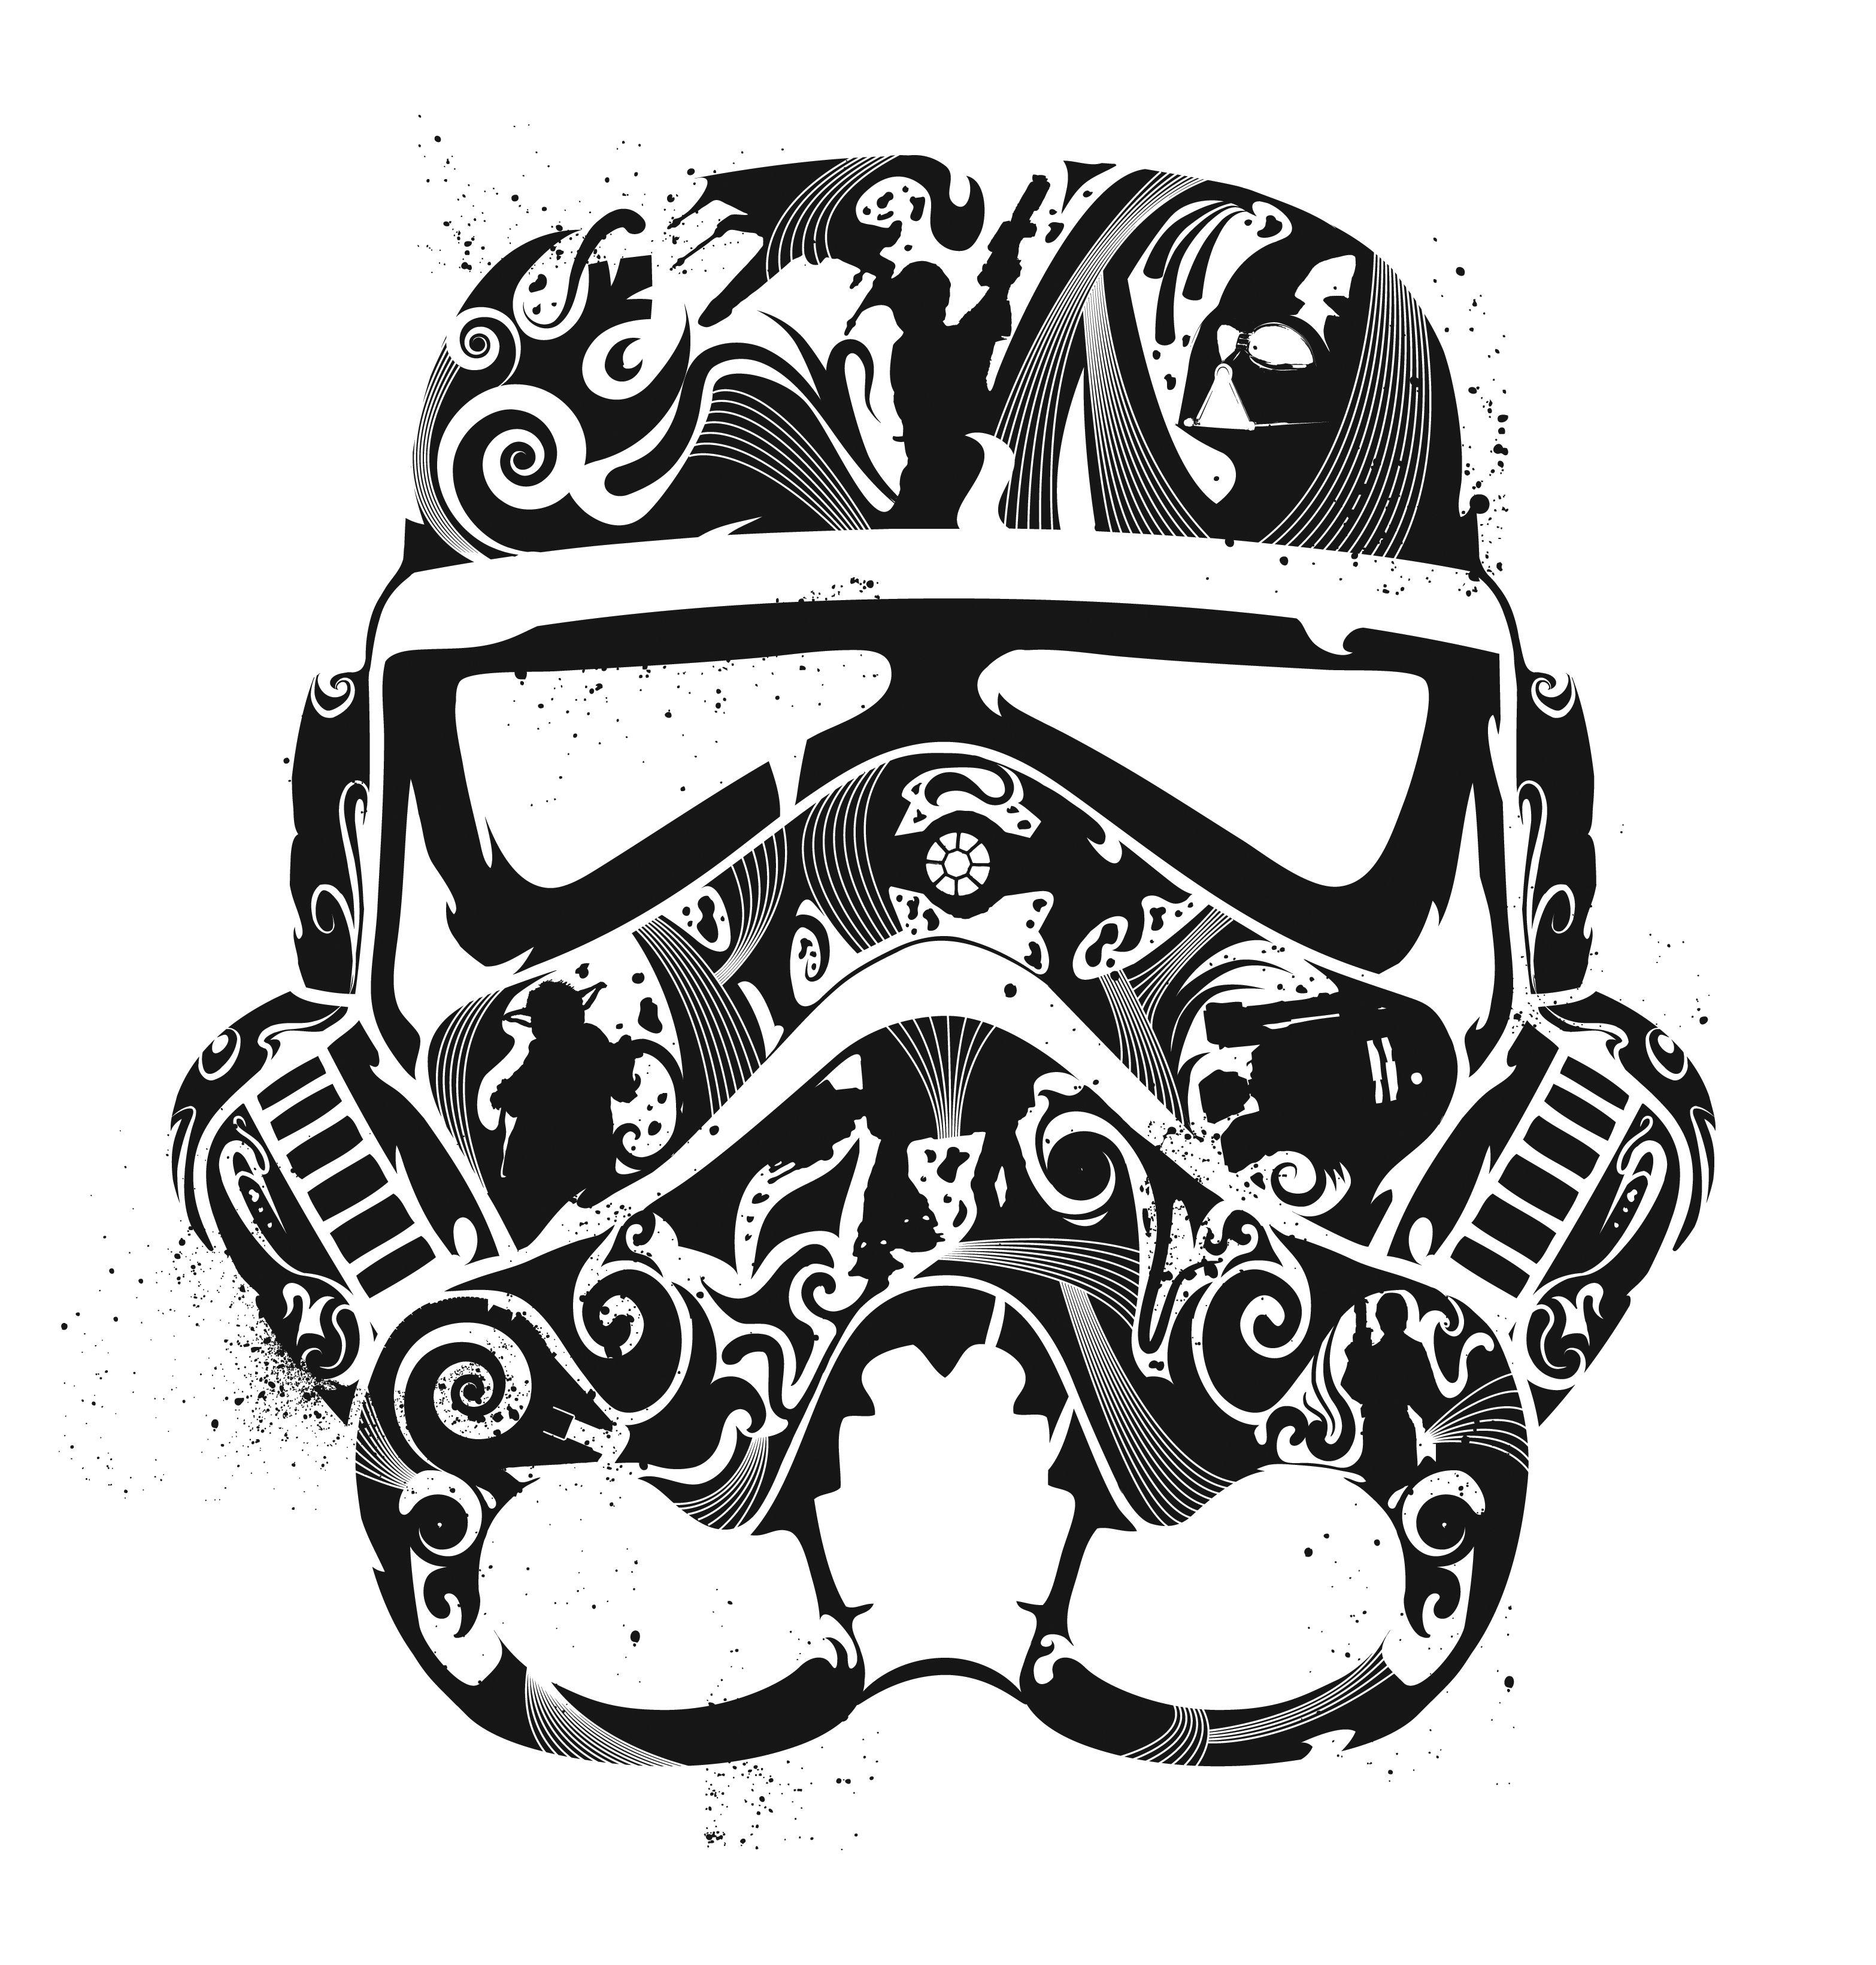 stormtrooper helmet drawing Google Search Coloring